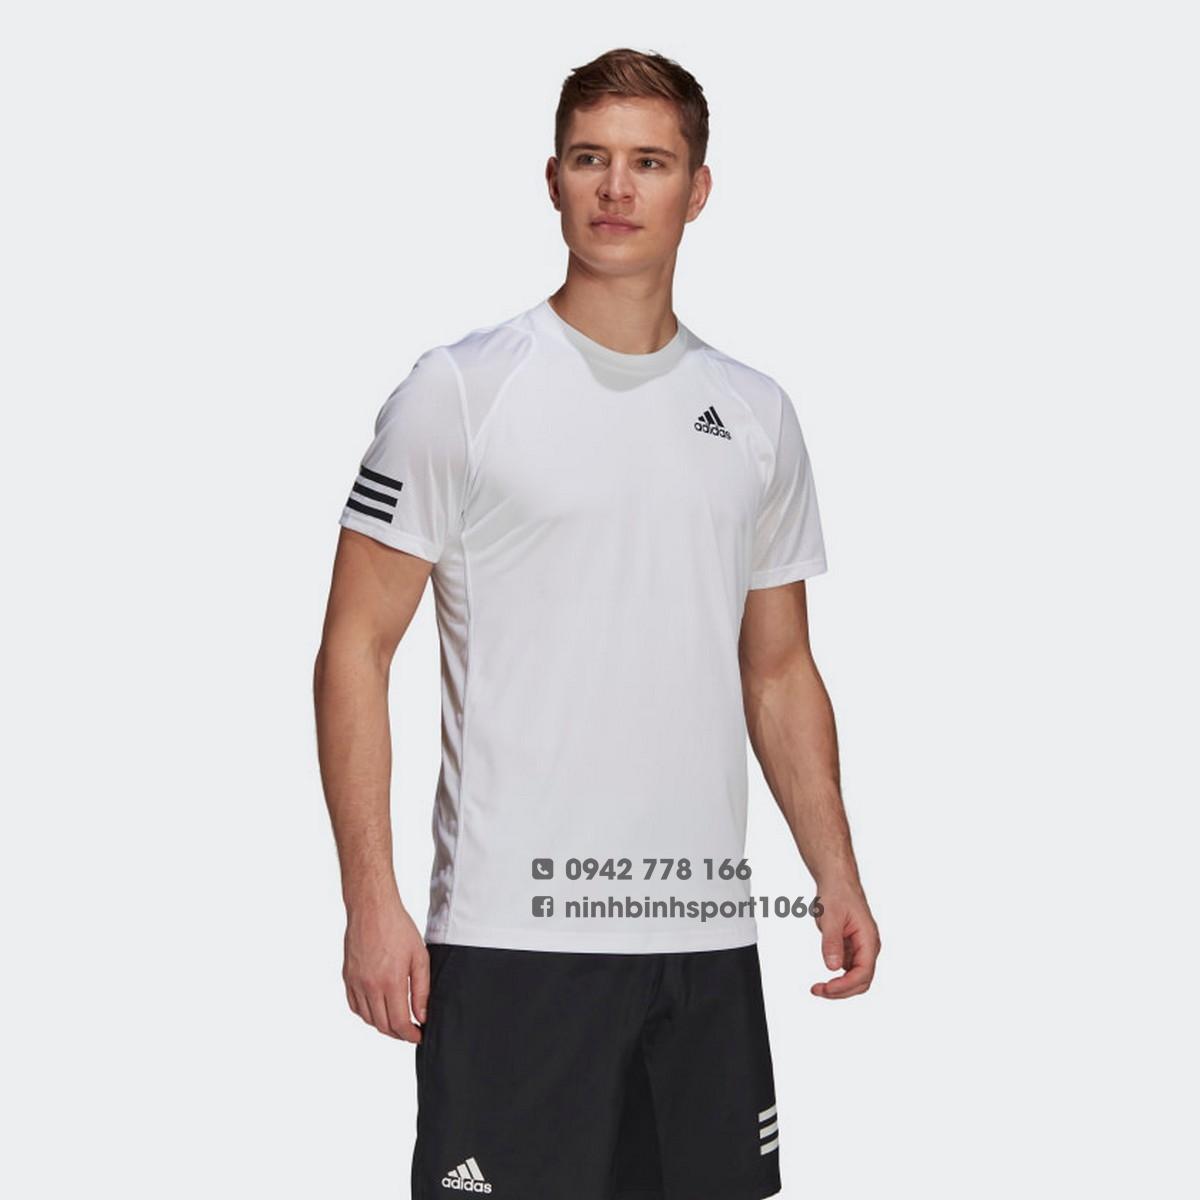 Áo thể thao nam Adidas Club 3 Stripe GL5401